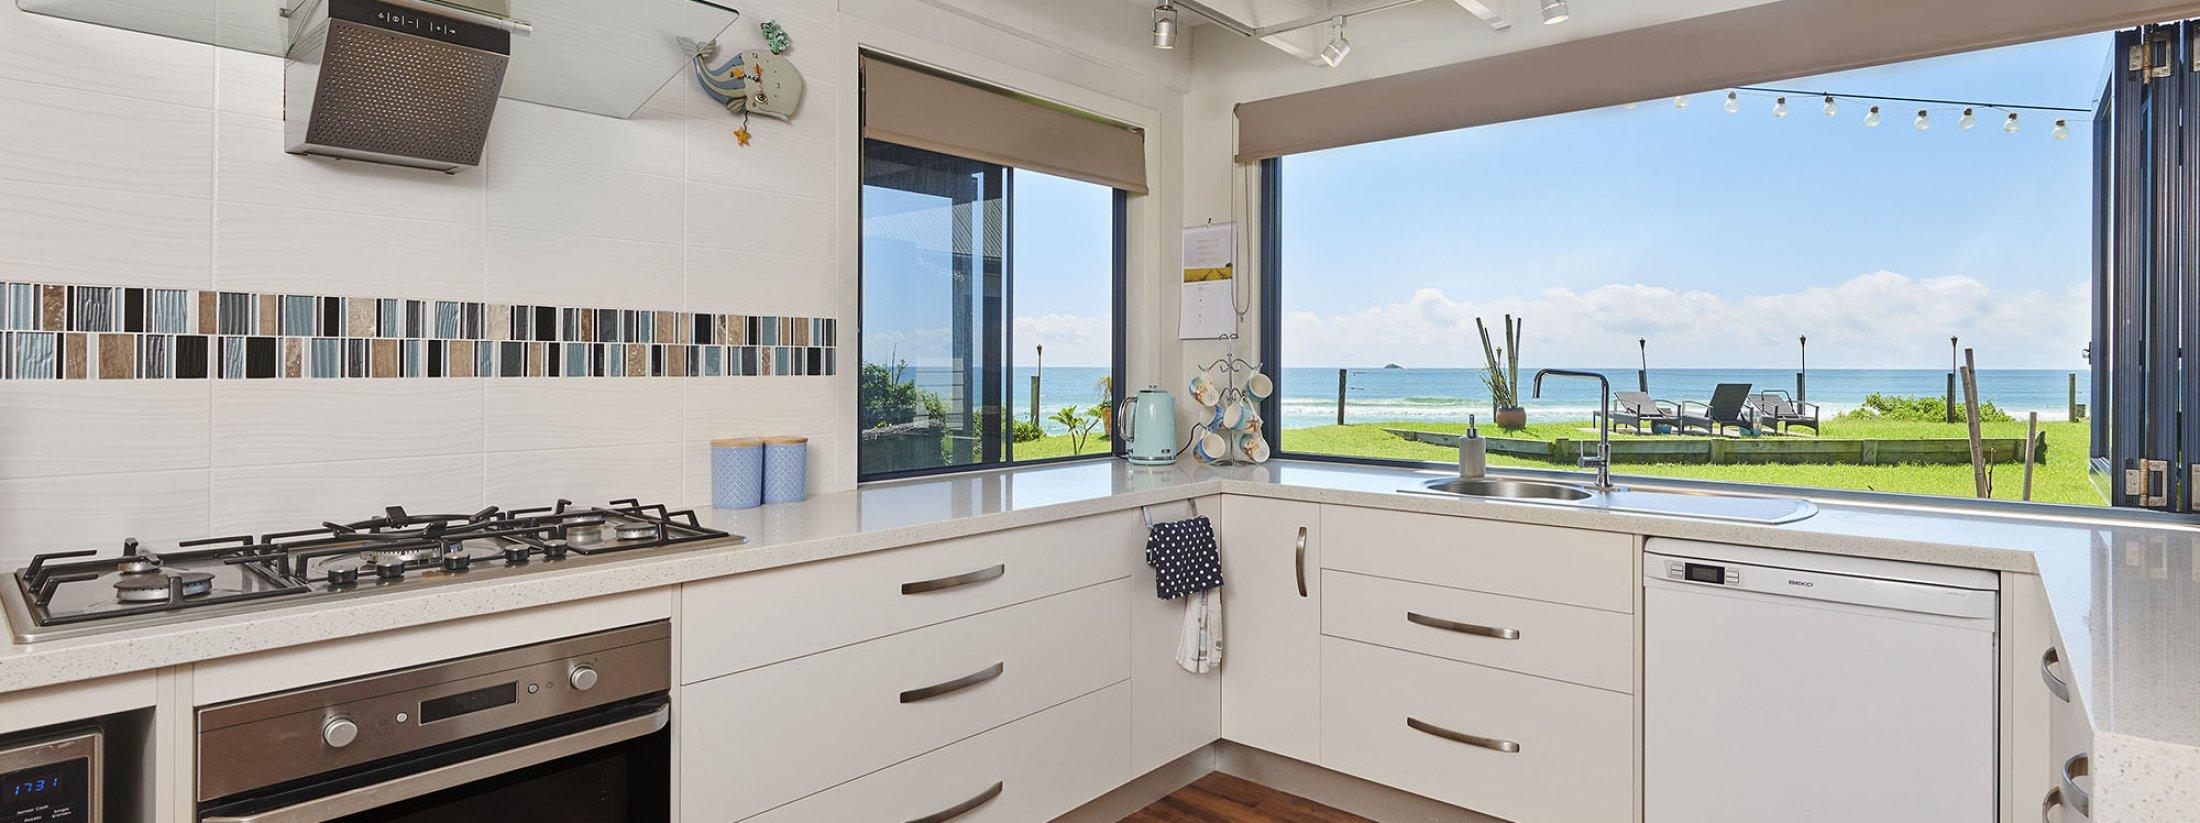 Belongil on The Beach - Byron Bay - Kitchen View